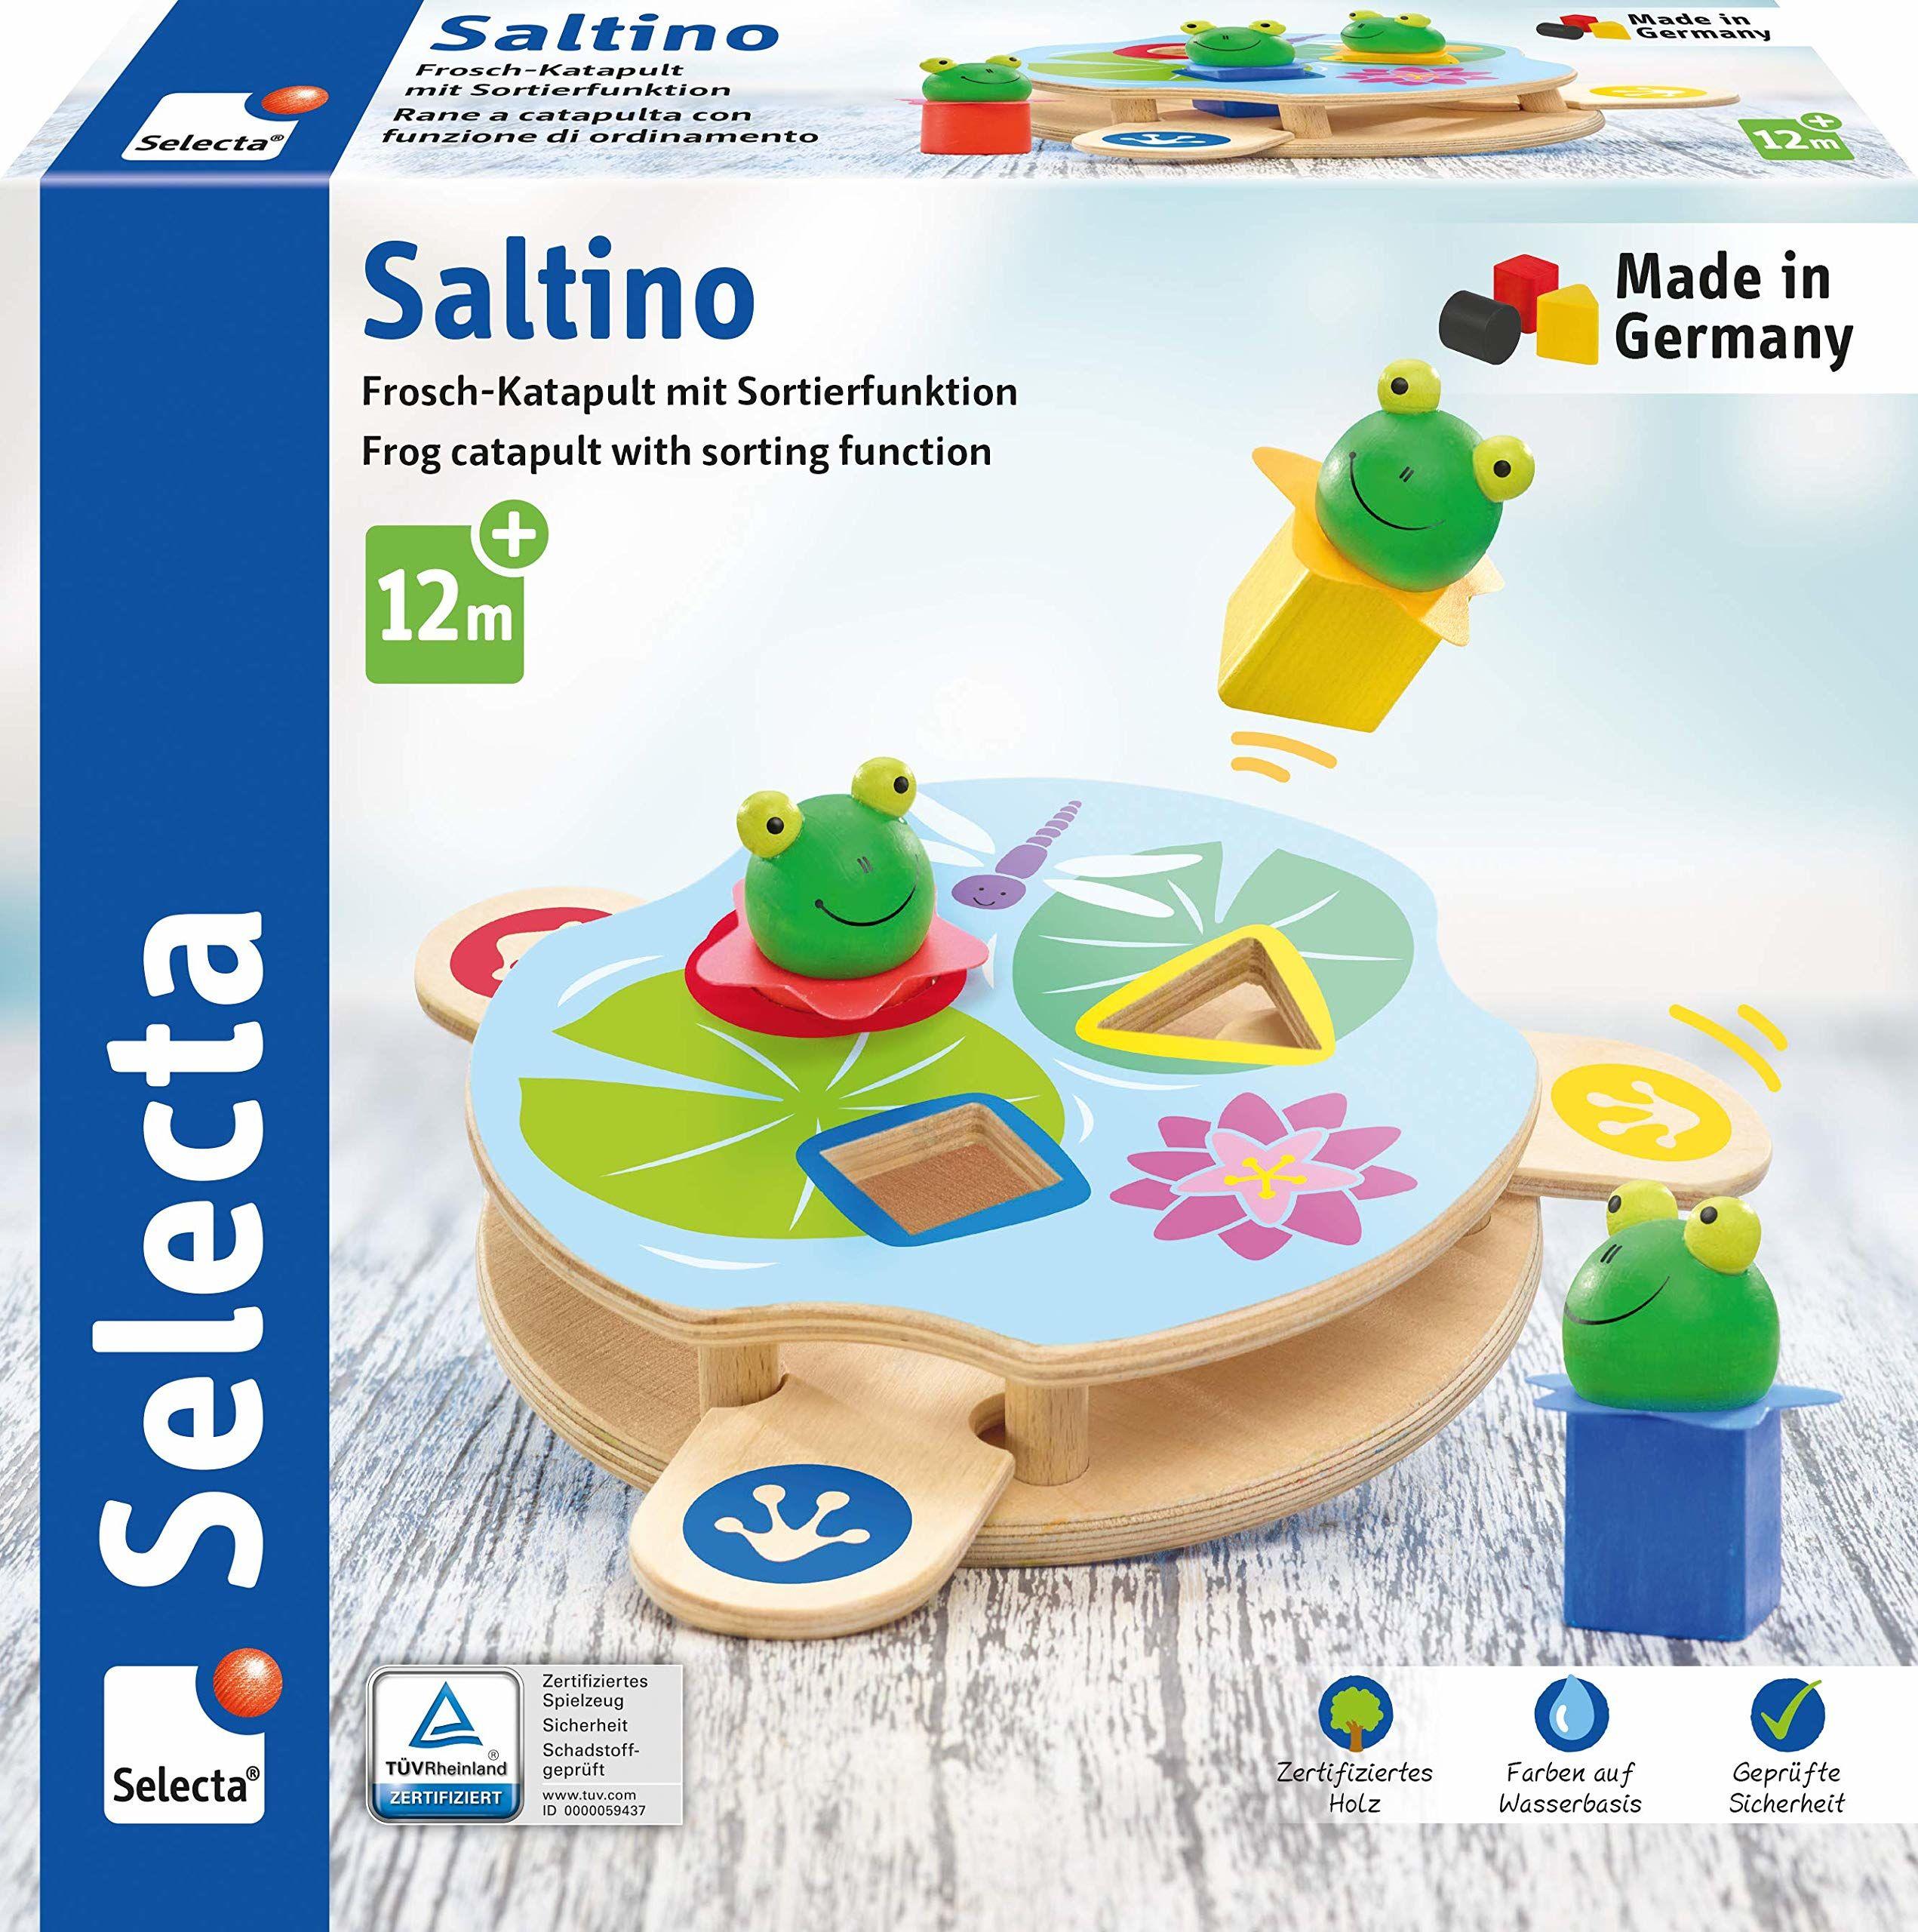 Selecta 62072 Saltino, zabawka motoryczna z drewna